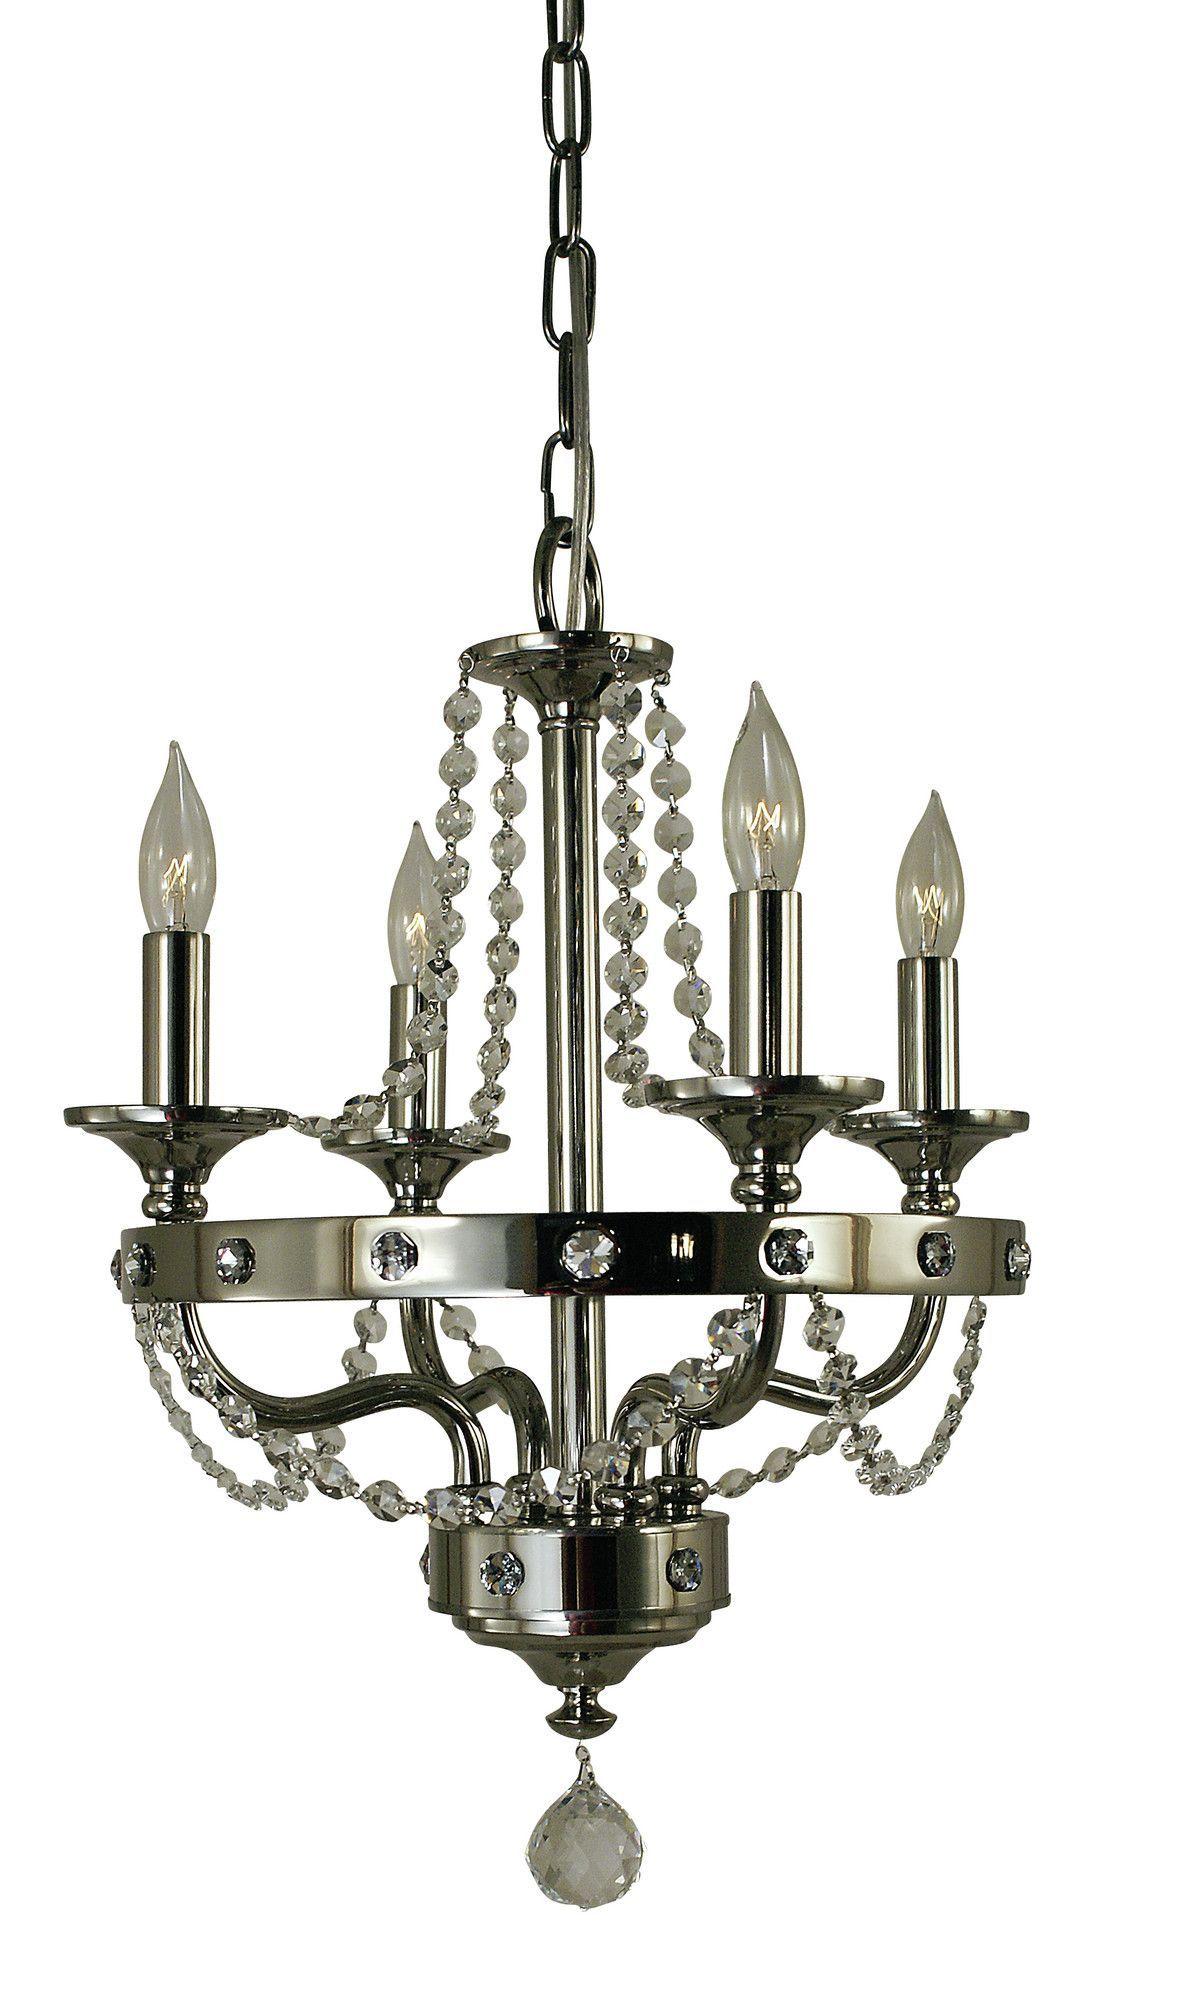 Isolde 4 Light Candle Chandelier